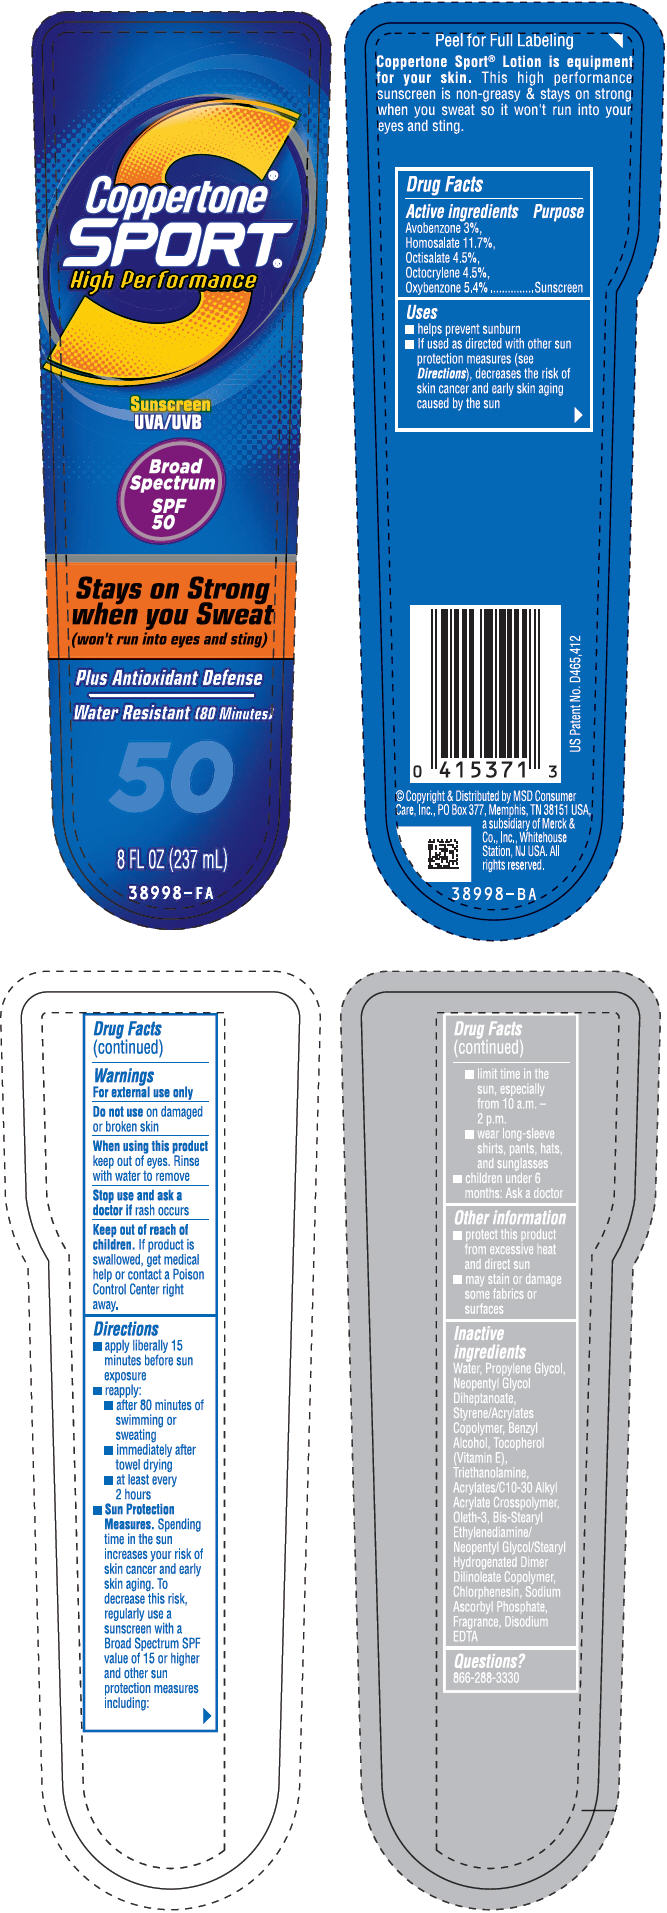 Principal Display Panel - 237 mL Bottle Label